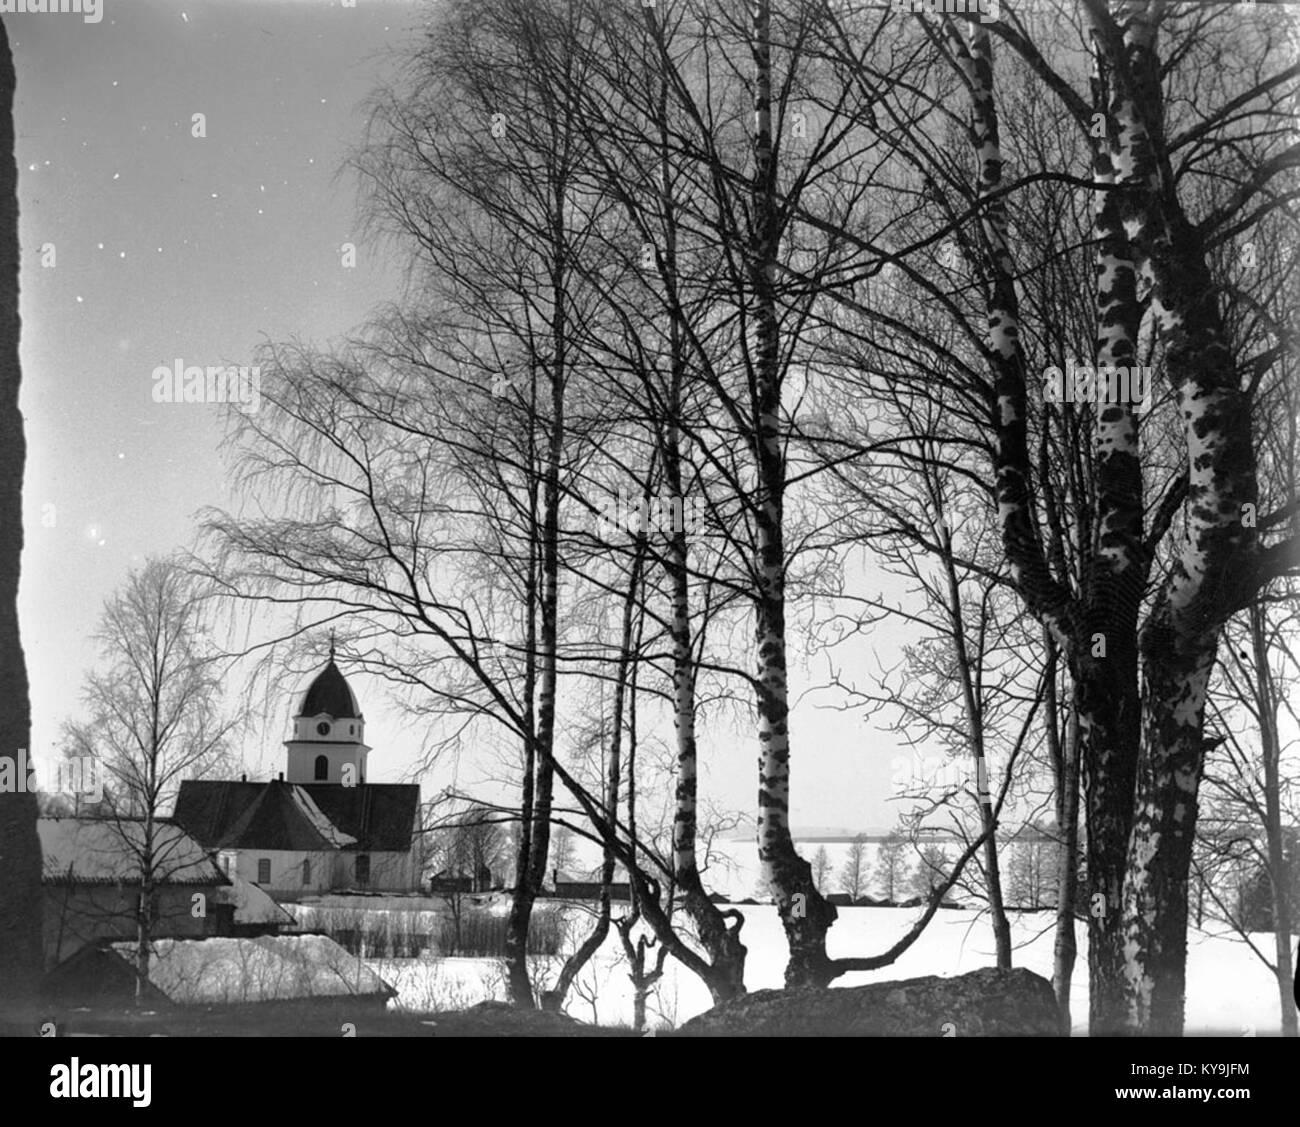 Rättvik Church, Dalarna, Sweden - Stock Image